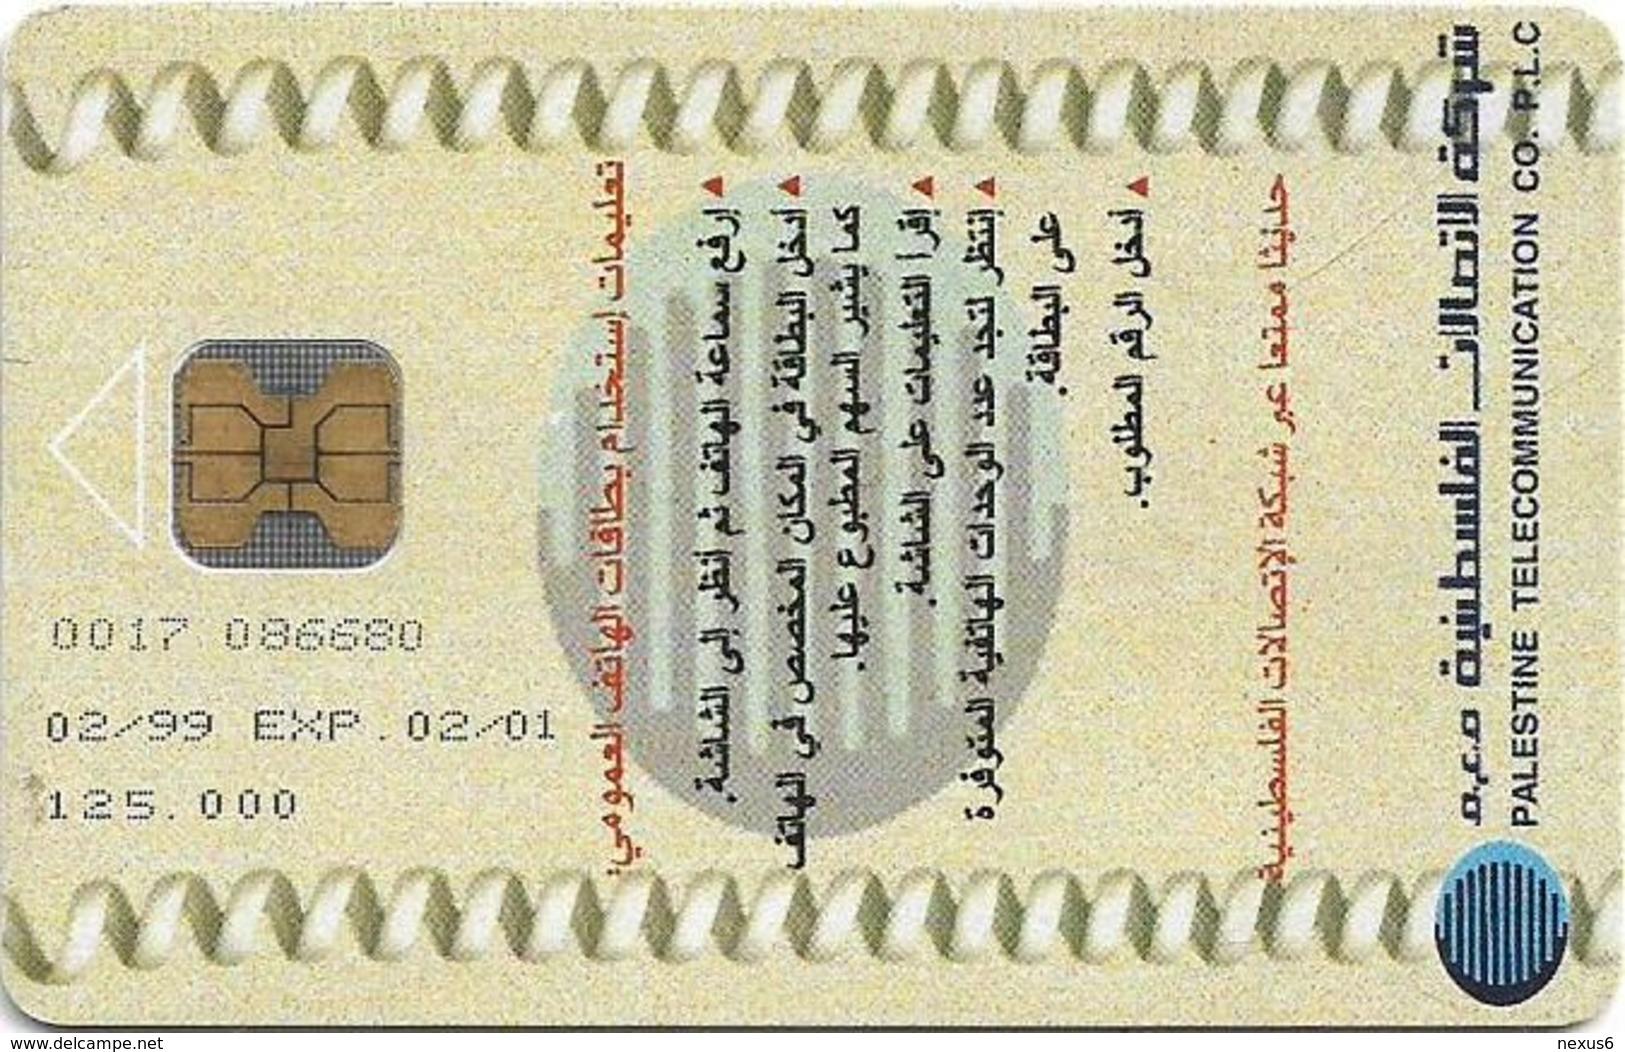 Palestine - Paltel (Chip) - Banknote Palestian Pound, 02.1999, Chip Oberthur, 10U, 125.000ex, Used - Palestine